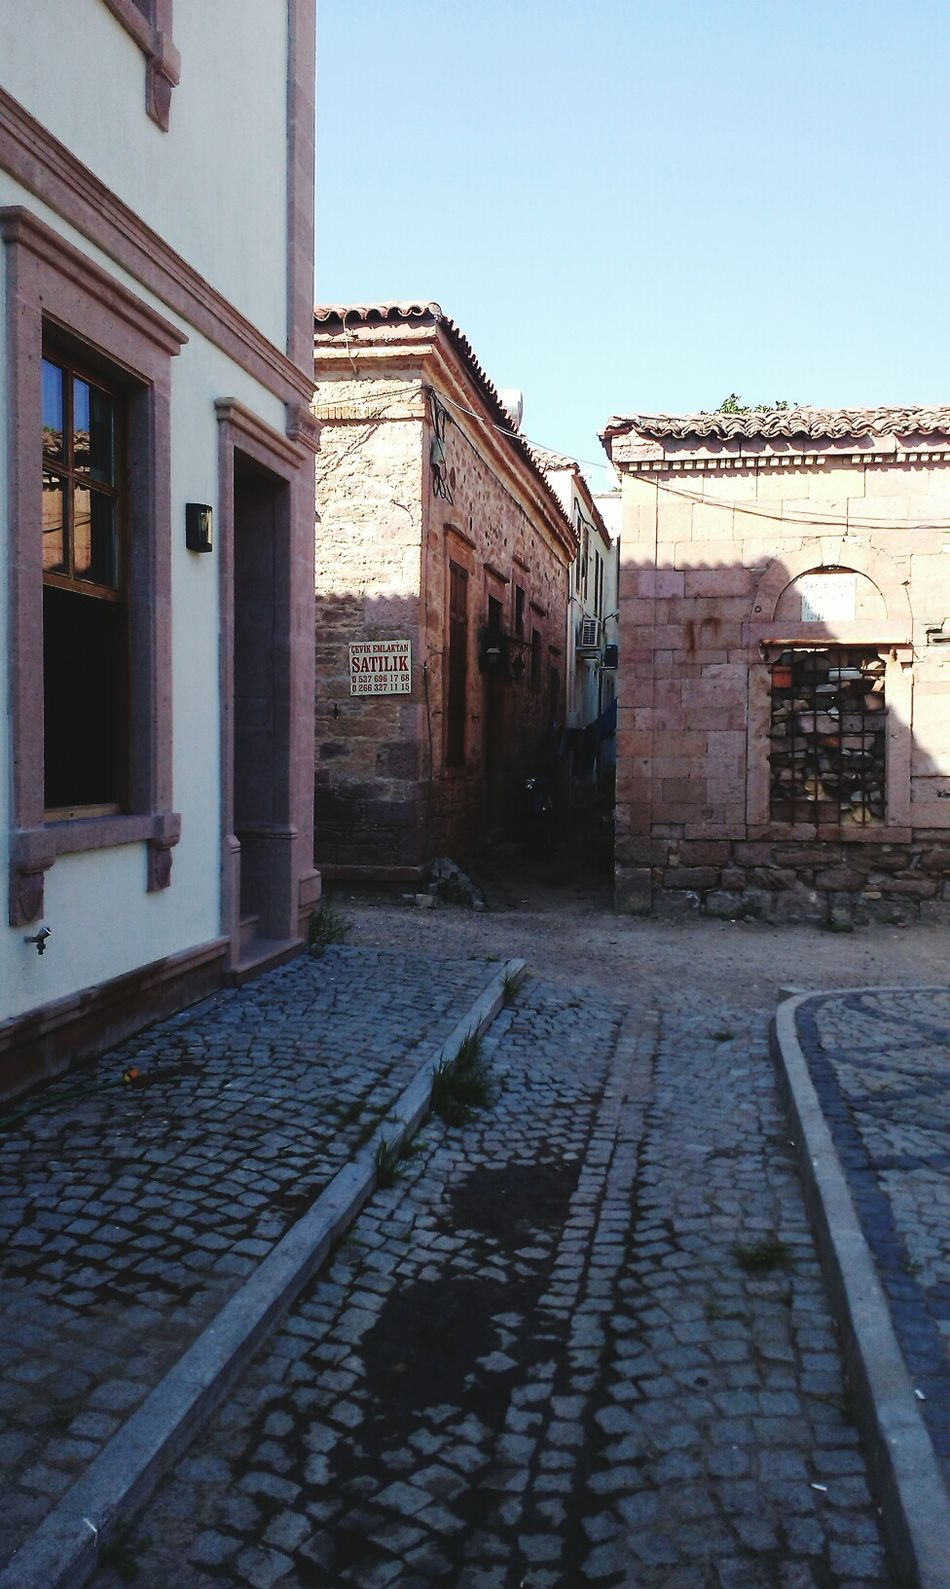 Turkey Balikesir Cunda Island Enjoying Life Hanging Out Ayvalik 🐚🐳🐬🏊 Historical Building Old Buildings Old Ways Relaxing Sweet♡ Windows Doors Neighborhood